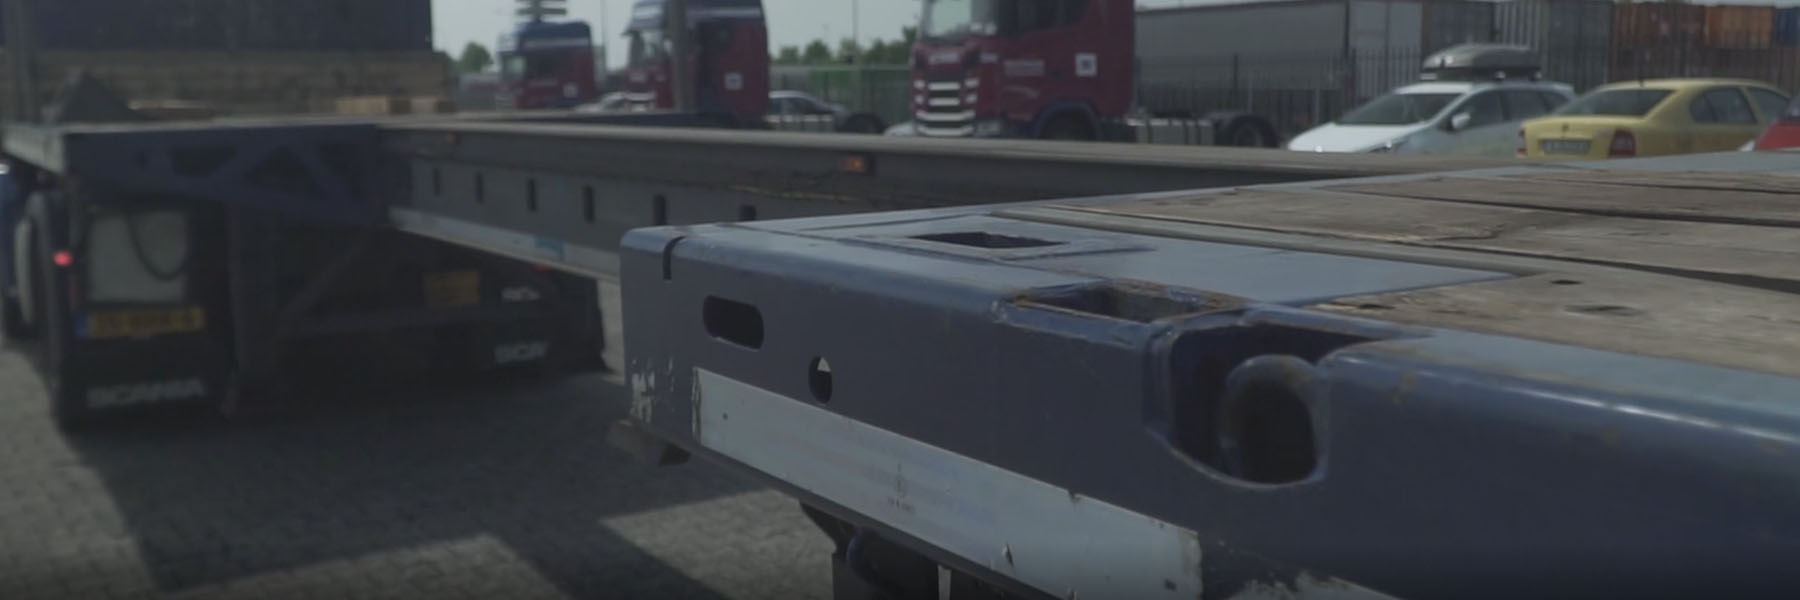 Exeptioneel transport